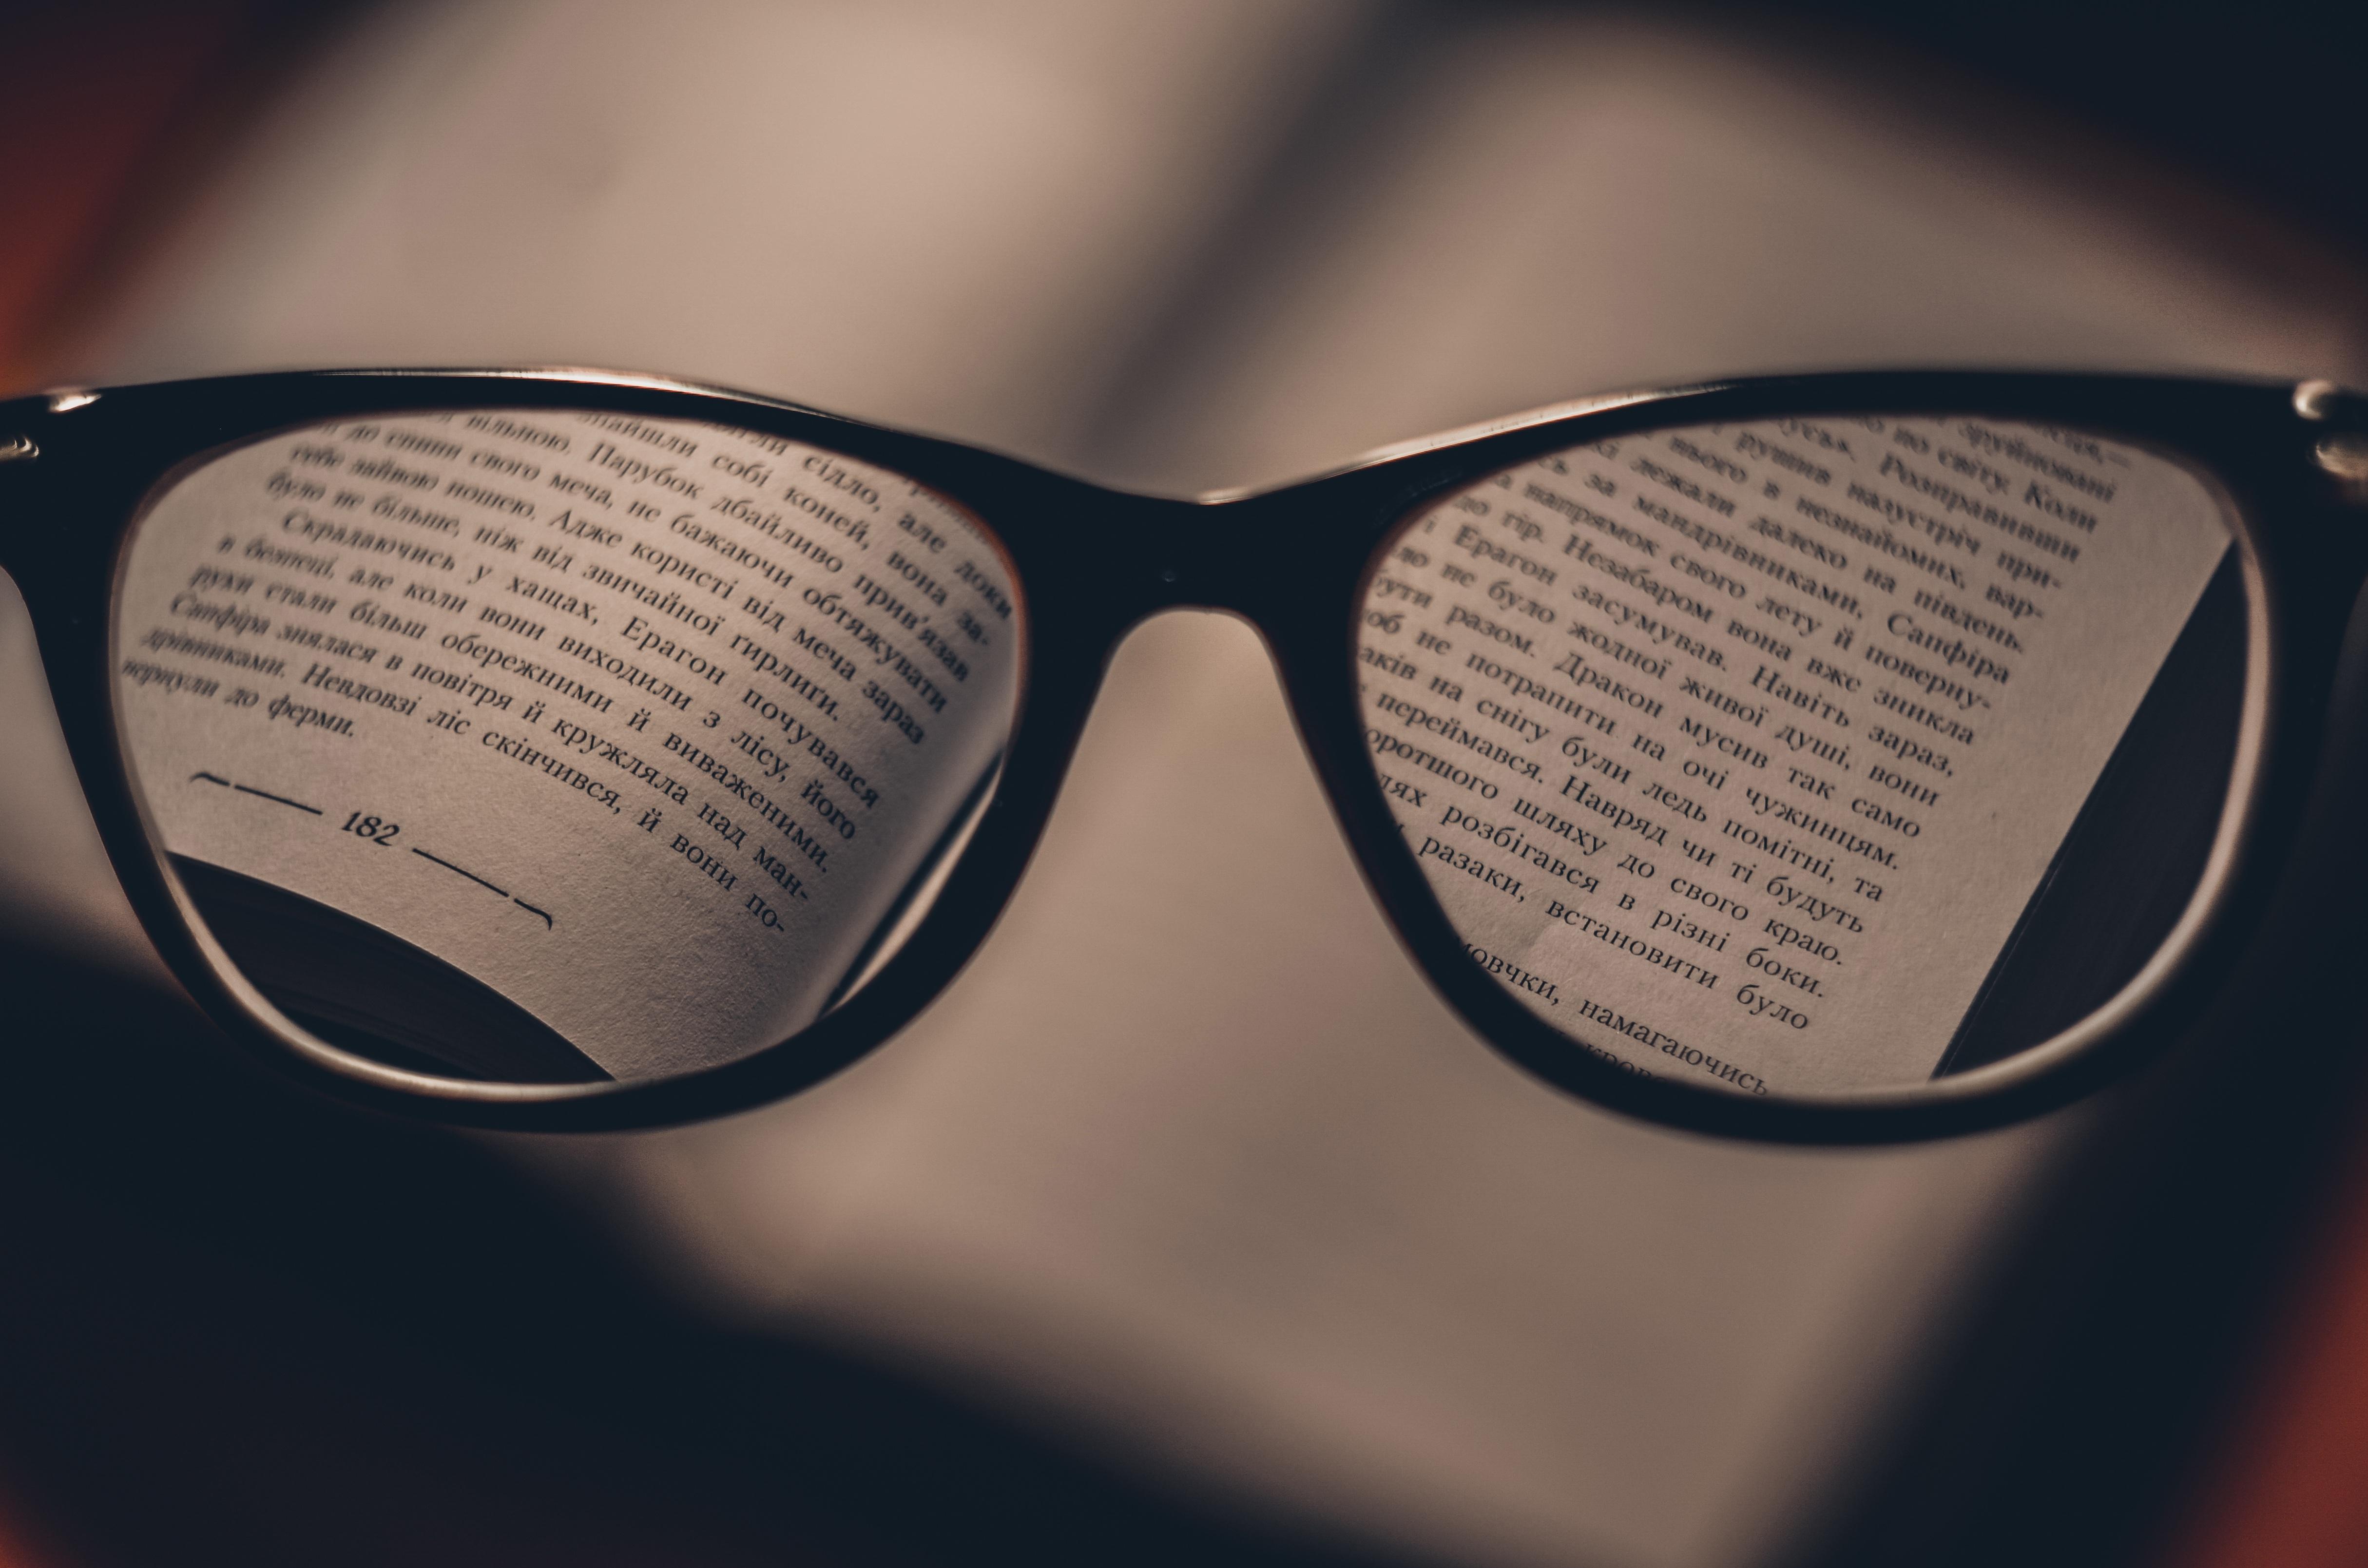 Clarify of multilingual through glasses